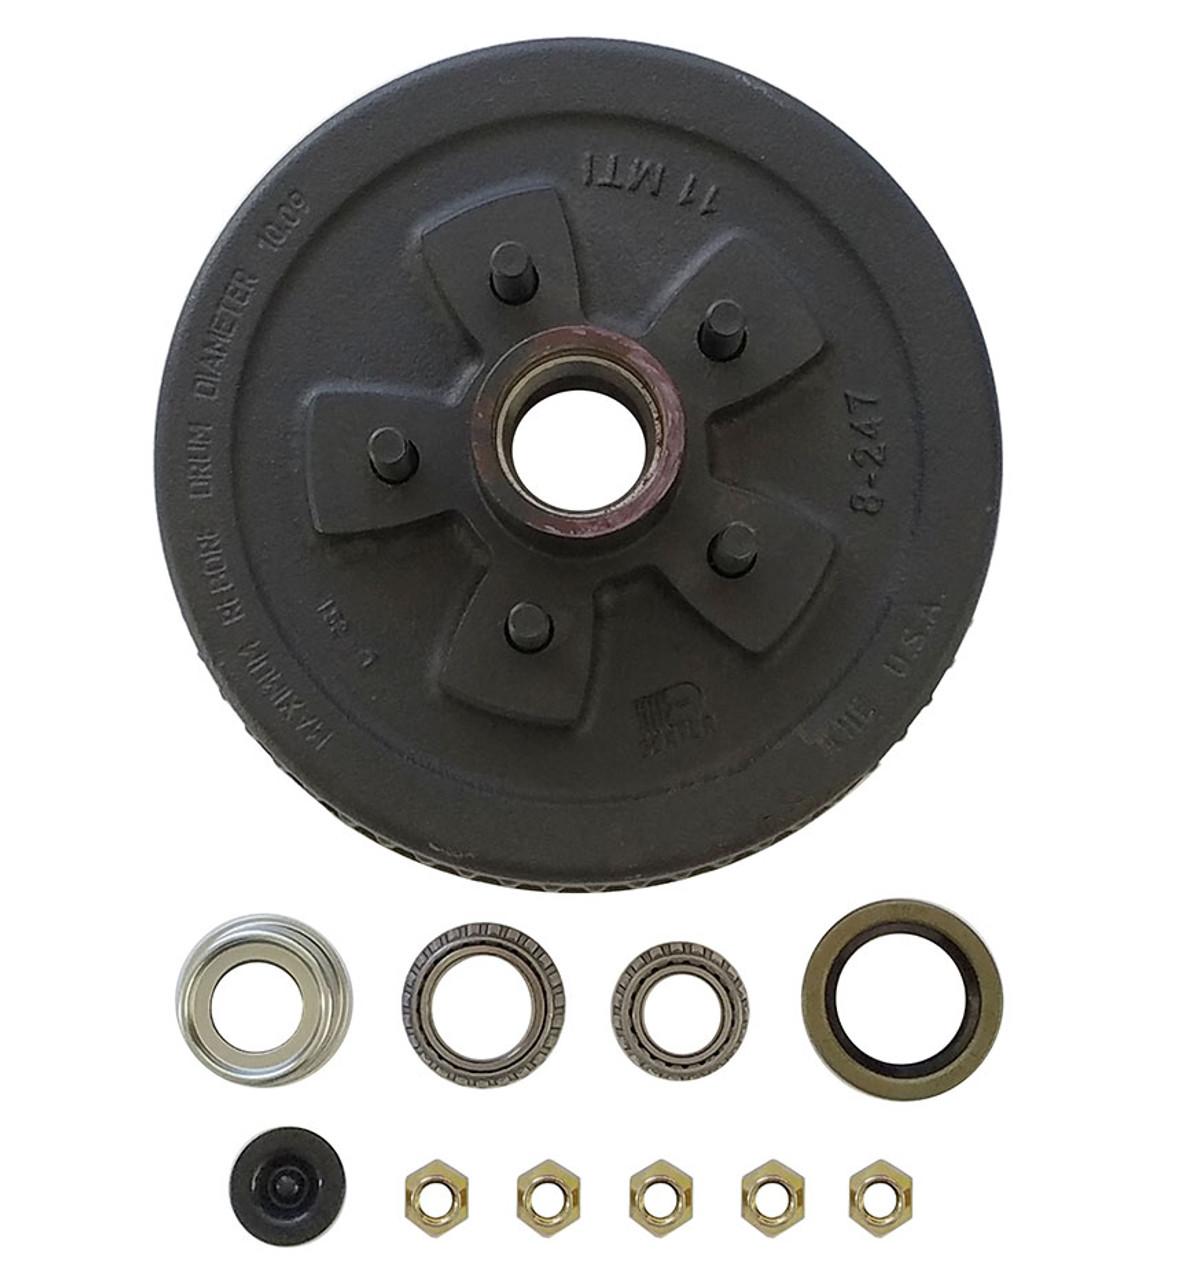 "1-545UHI-HDEZ --- 5 on 4-1/2"" Hub and Drum Assembly for 10"" Brakes - 3,500 lb - Ez Lube"